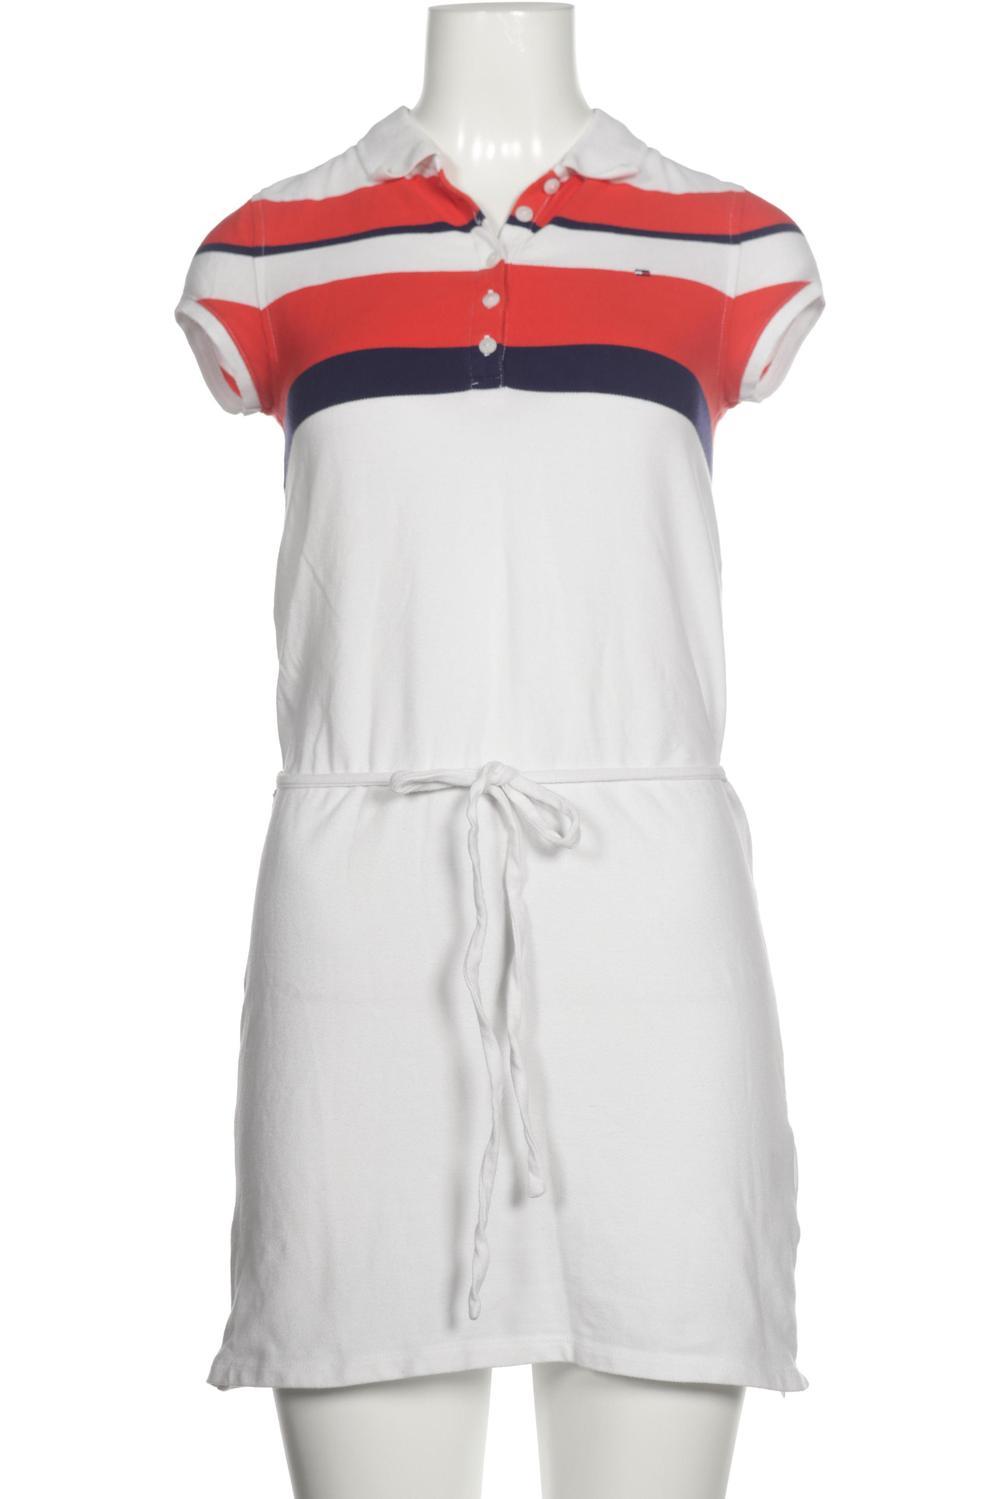 details zu tommy hilfiger kleid mädchen dress damenkleid gr. de 164  elasthan, b #14f4dc4